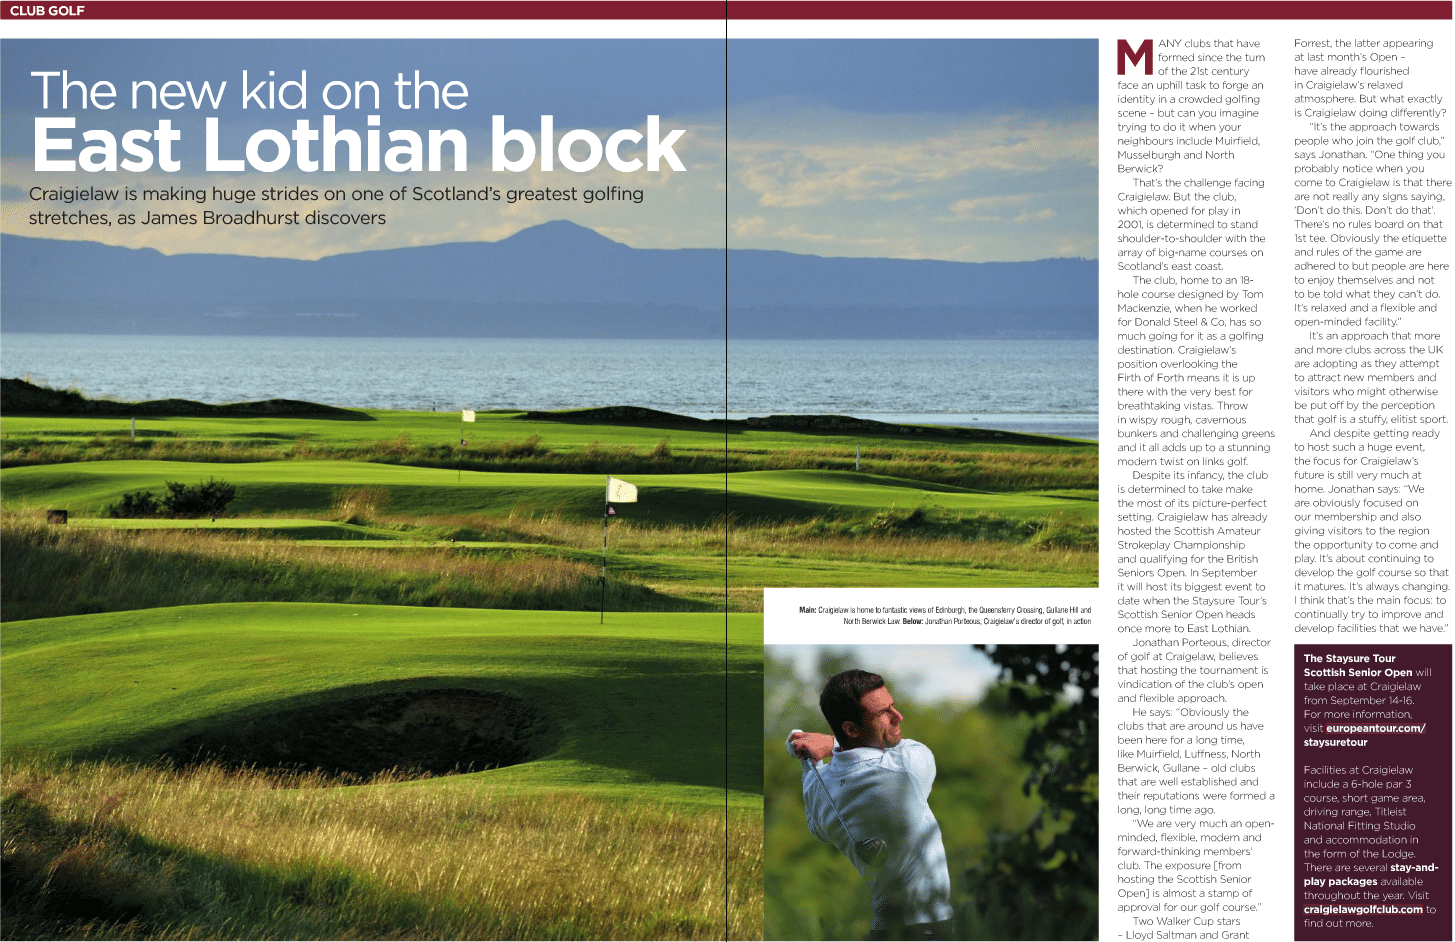 Scottish Senior Tour at Craigielaw - National Club Golfer